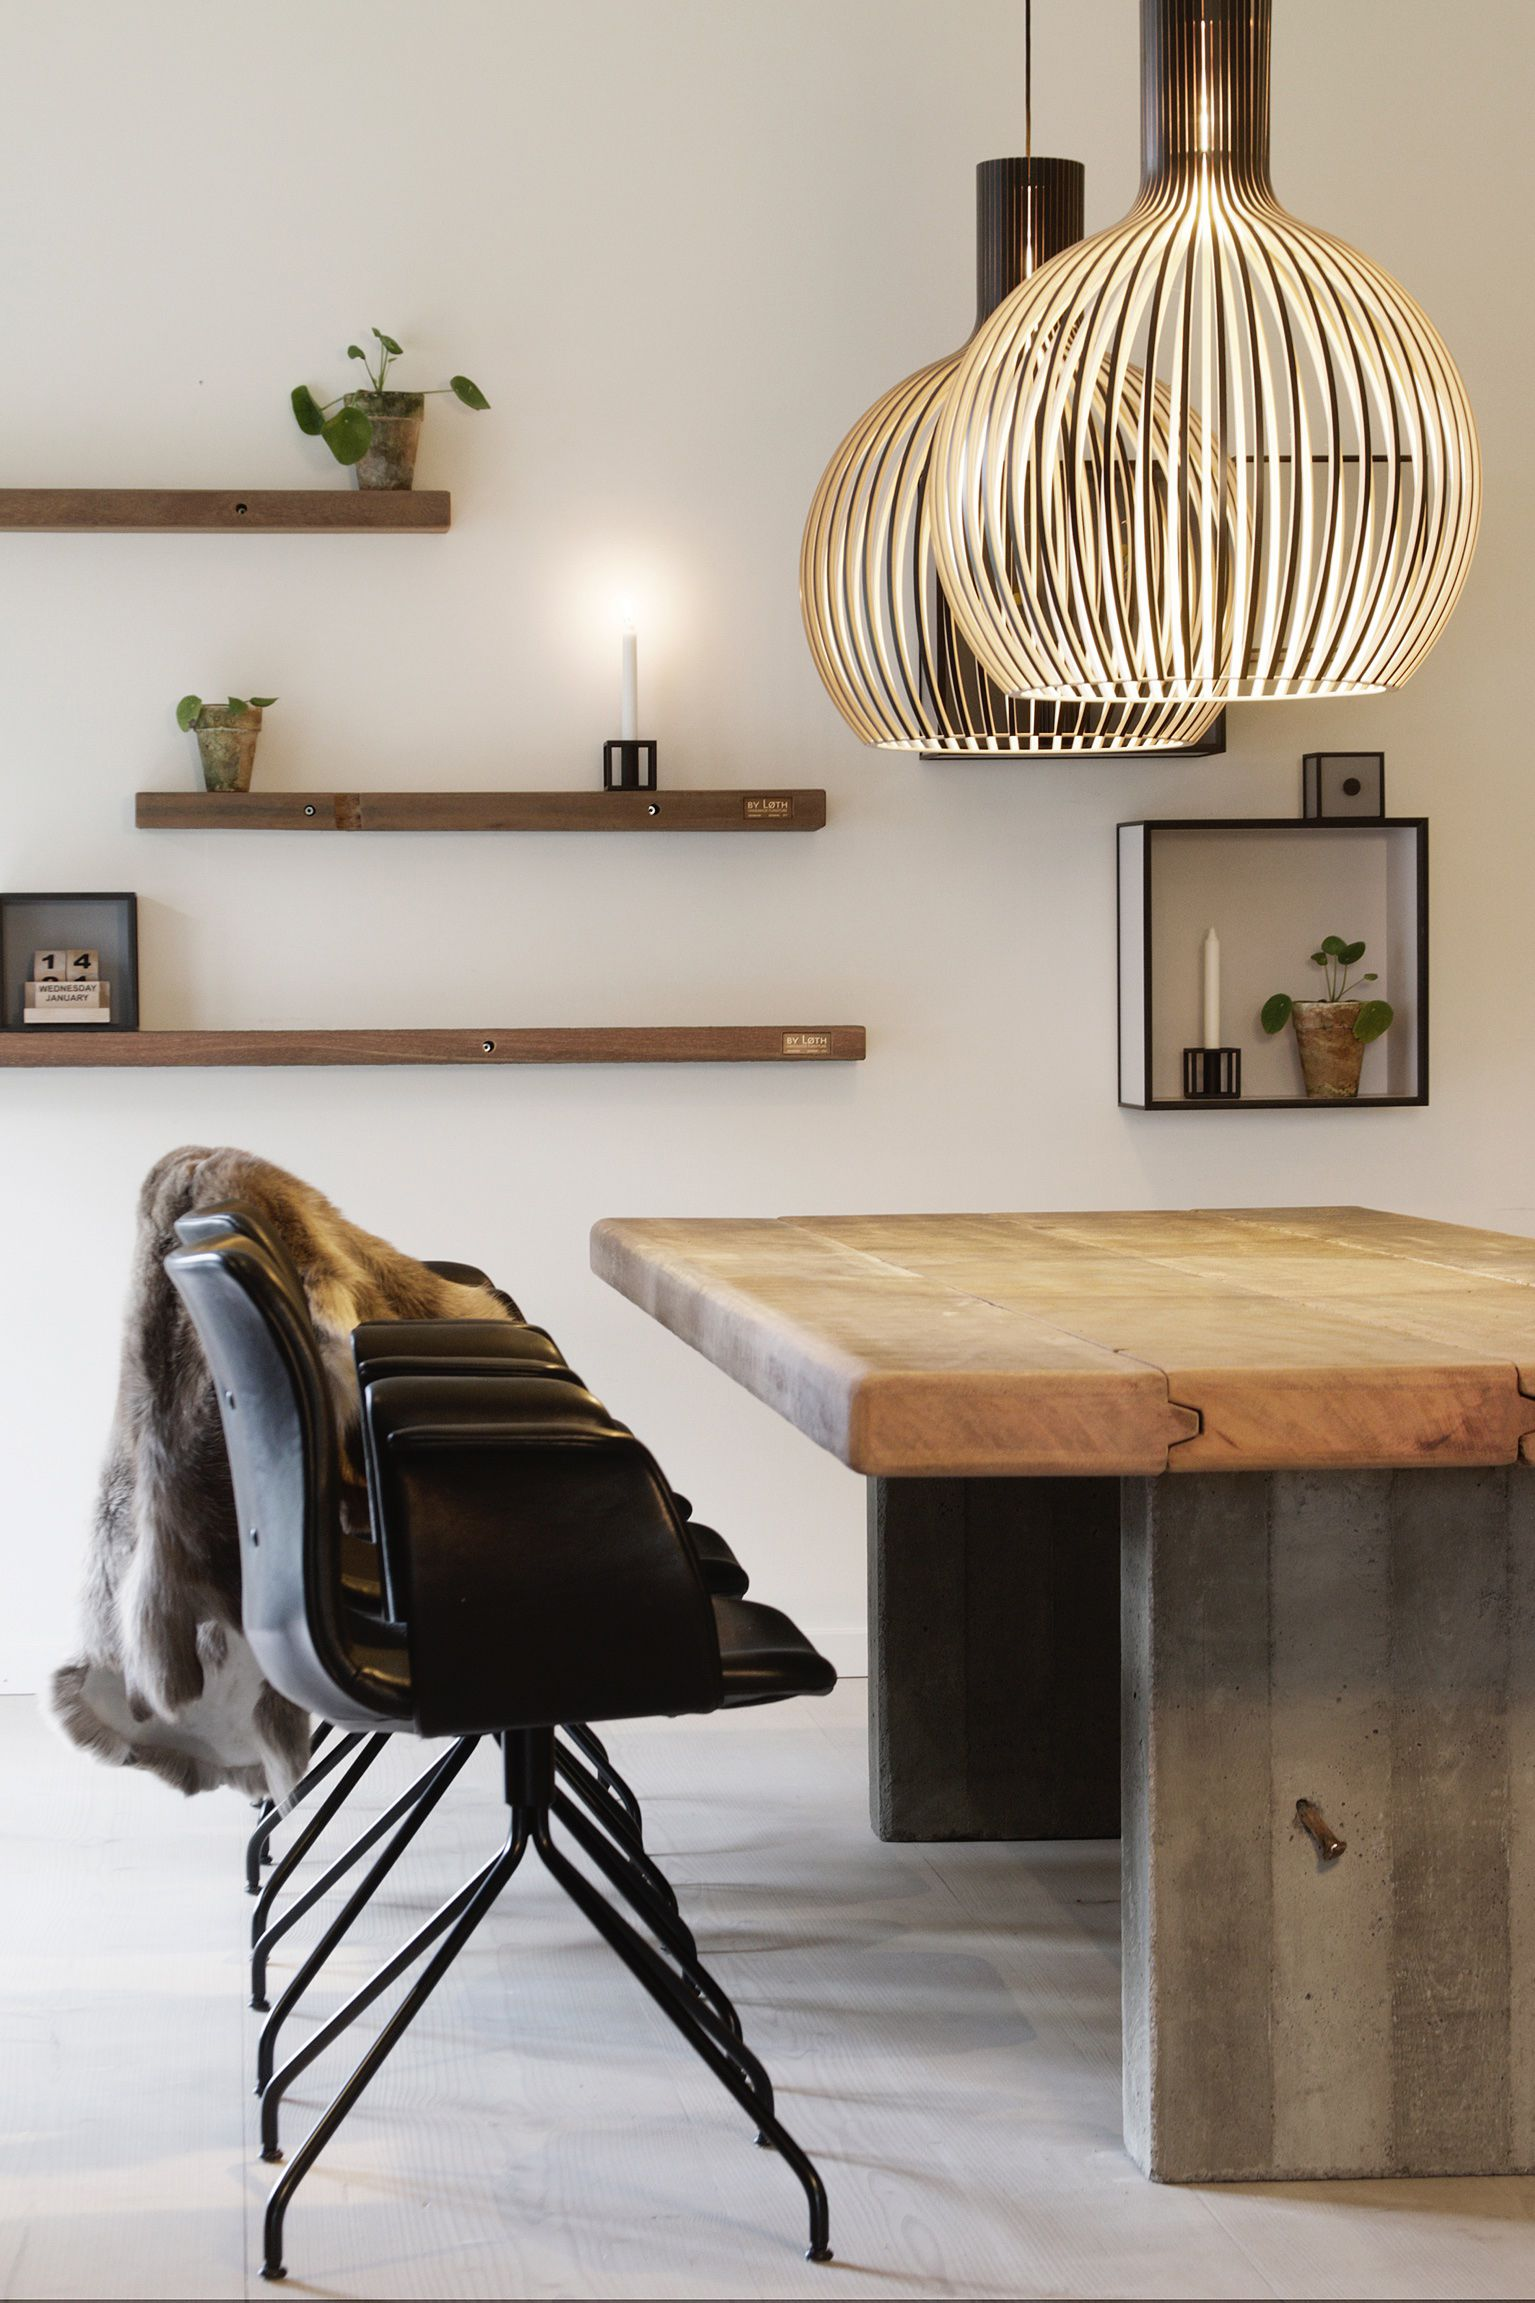 Conto #Design #Light #Modern #Kok Wooncenter #201610 | Verlichting ...